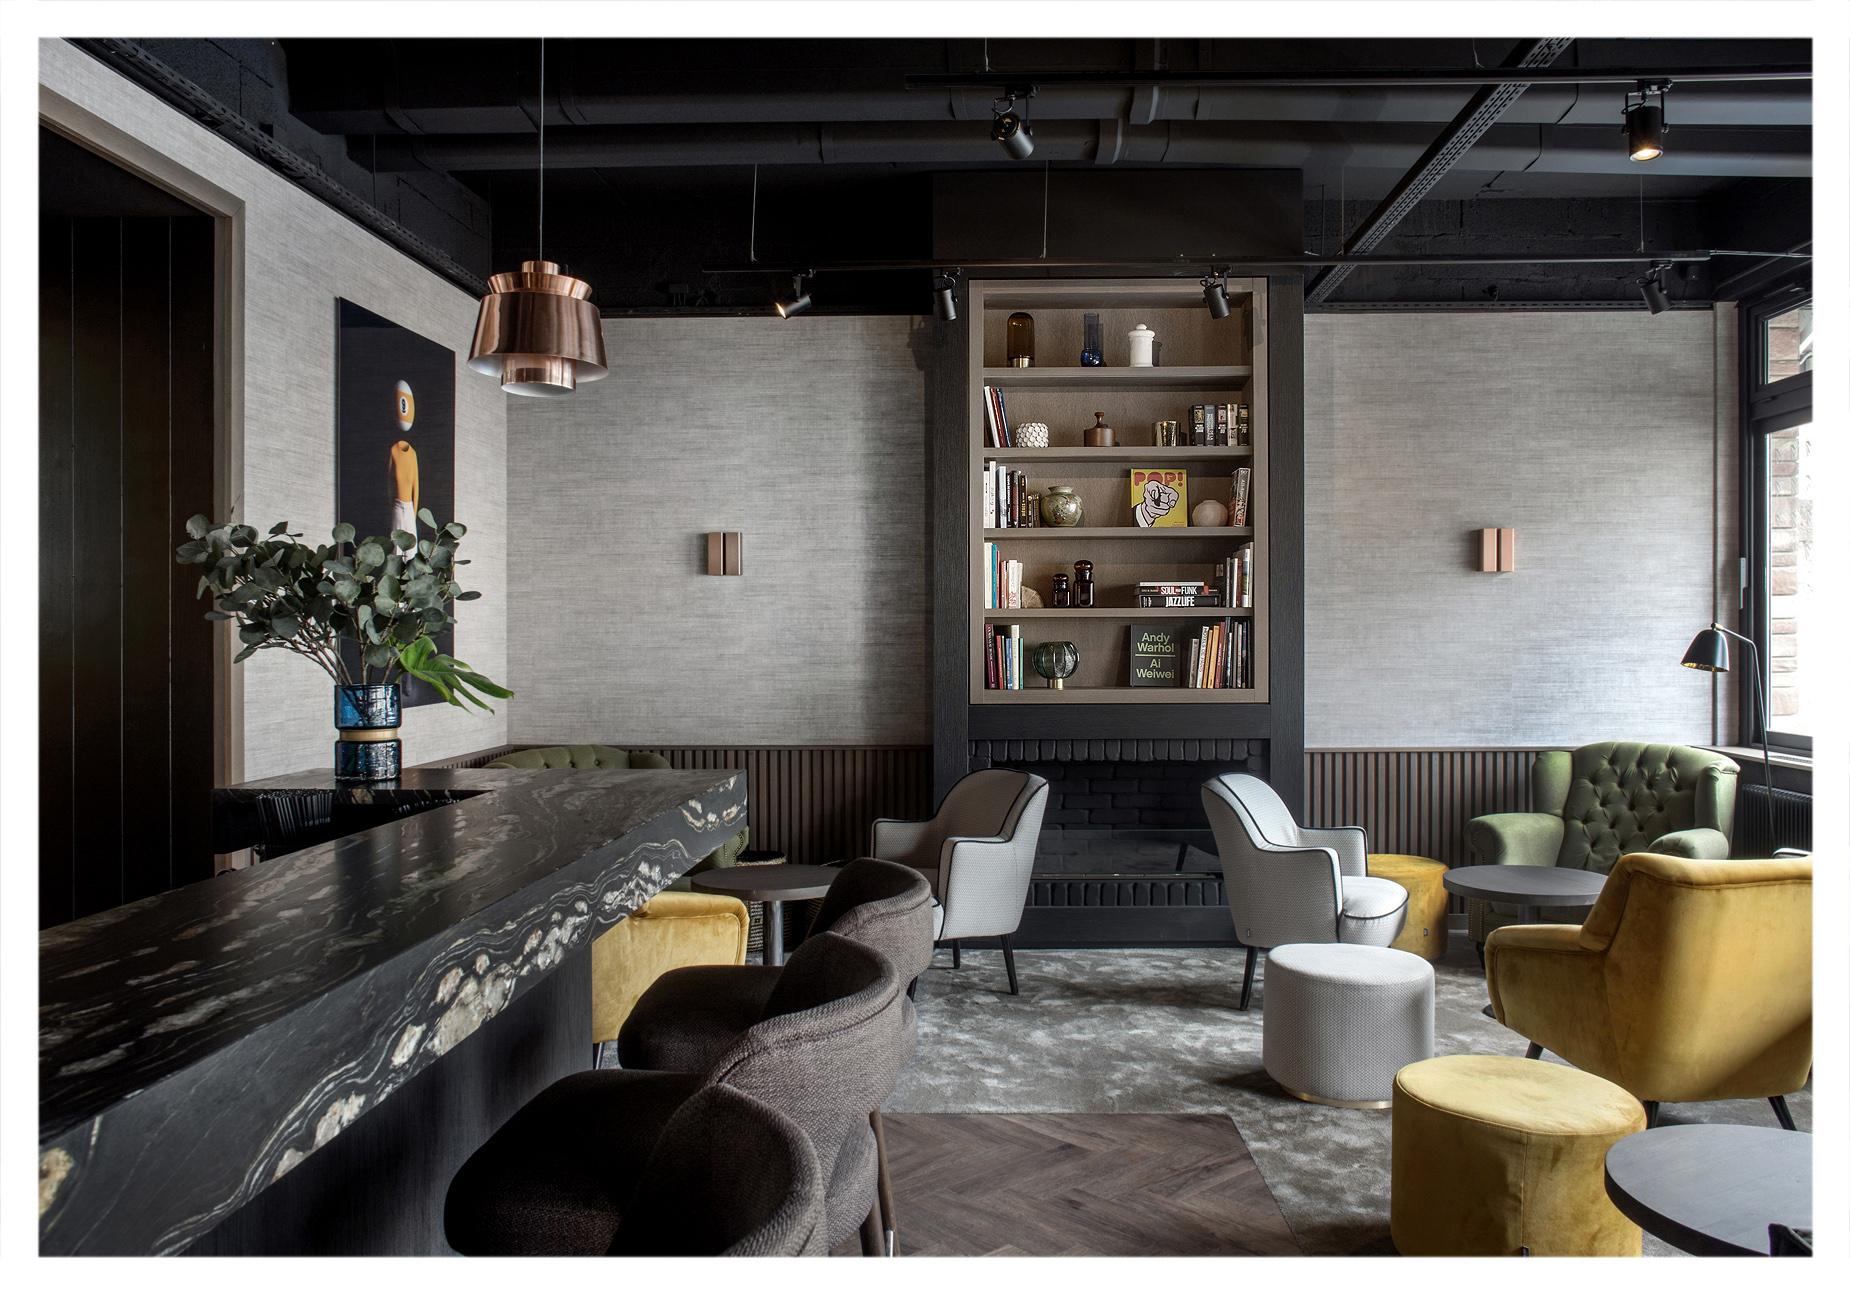 Hôtel Vaillant Bar and Lobby  Sélestat, France 2019